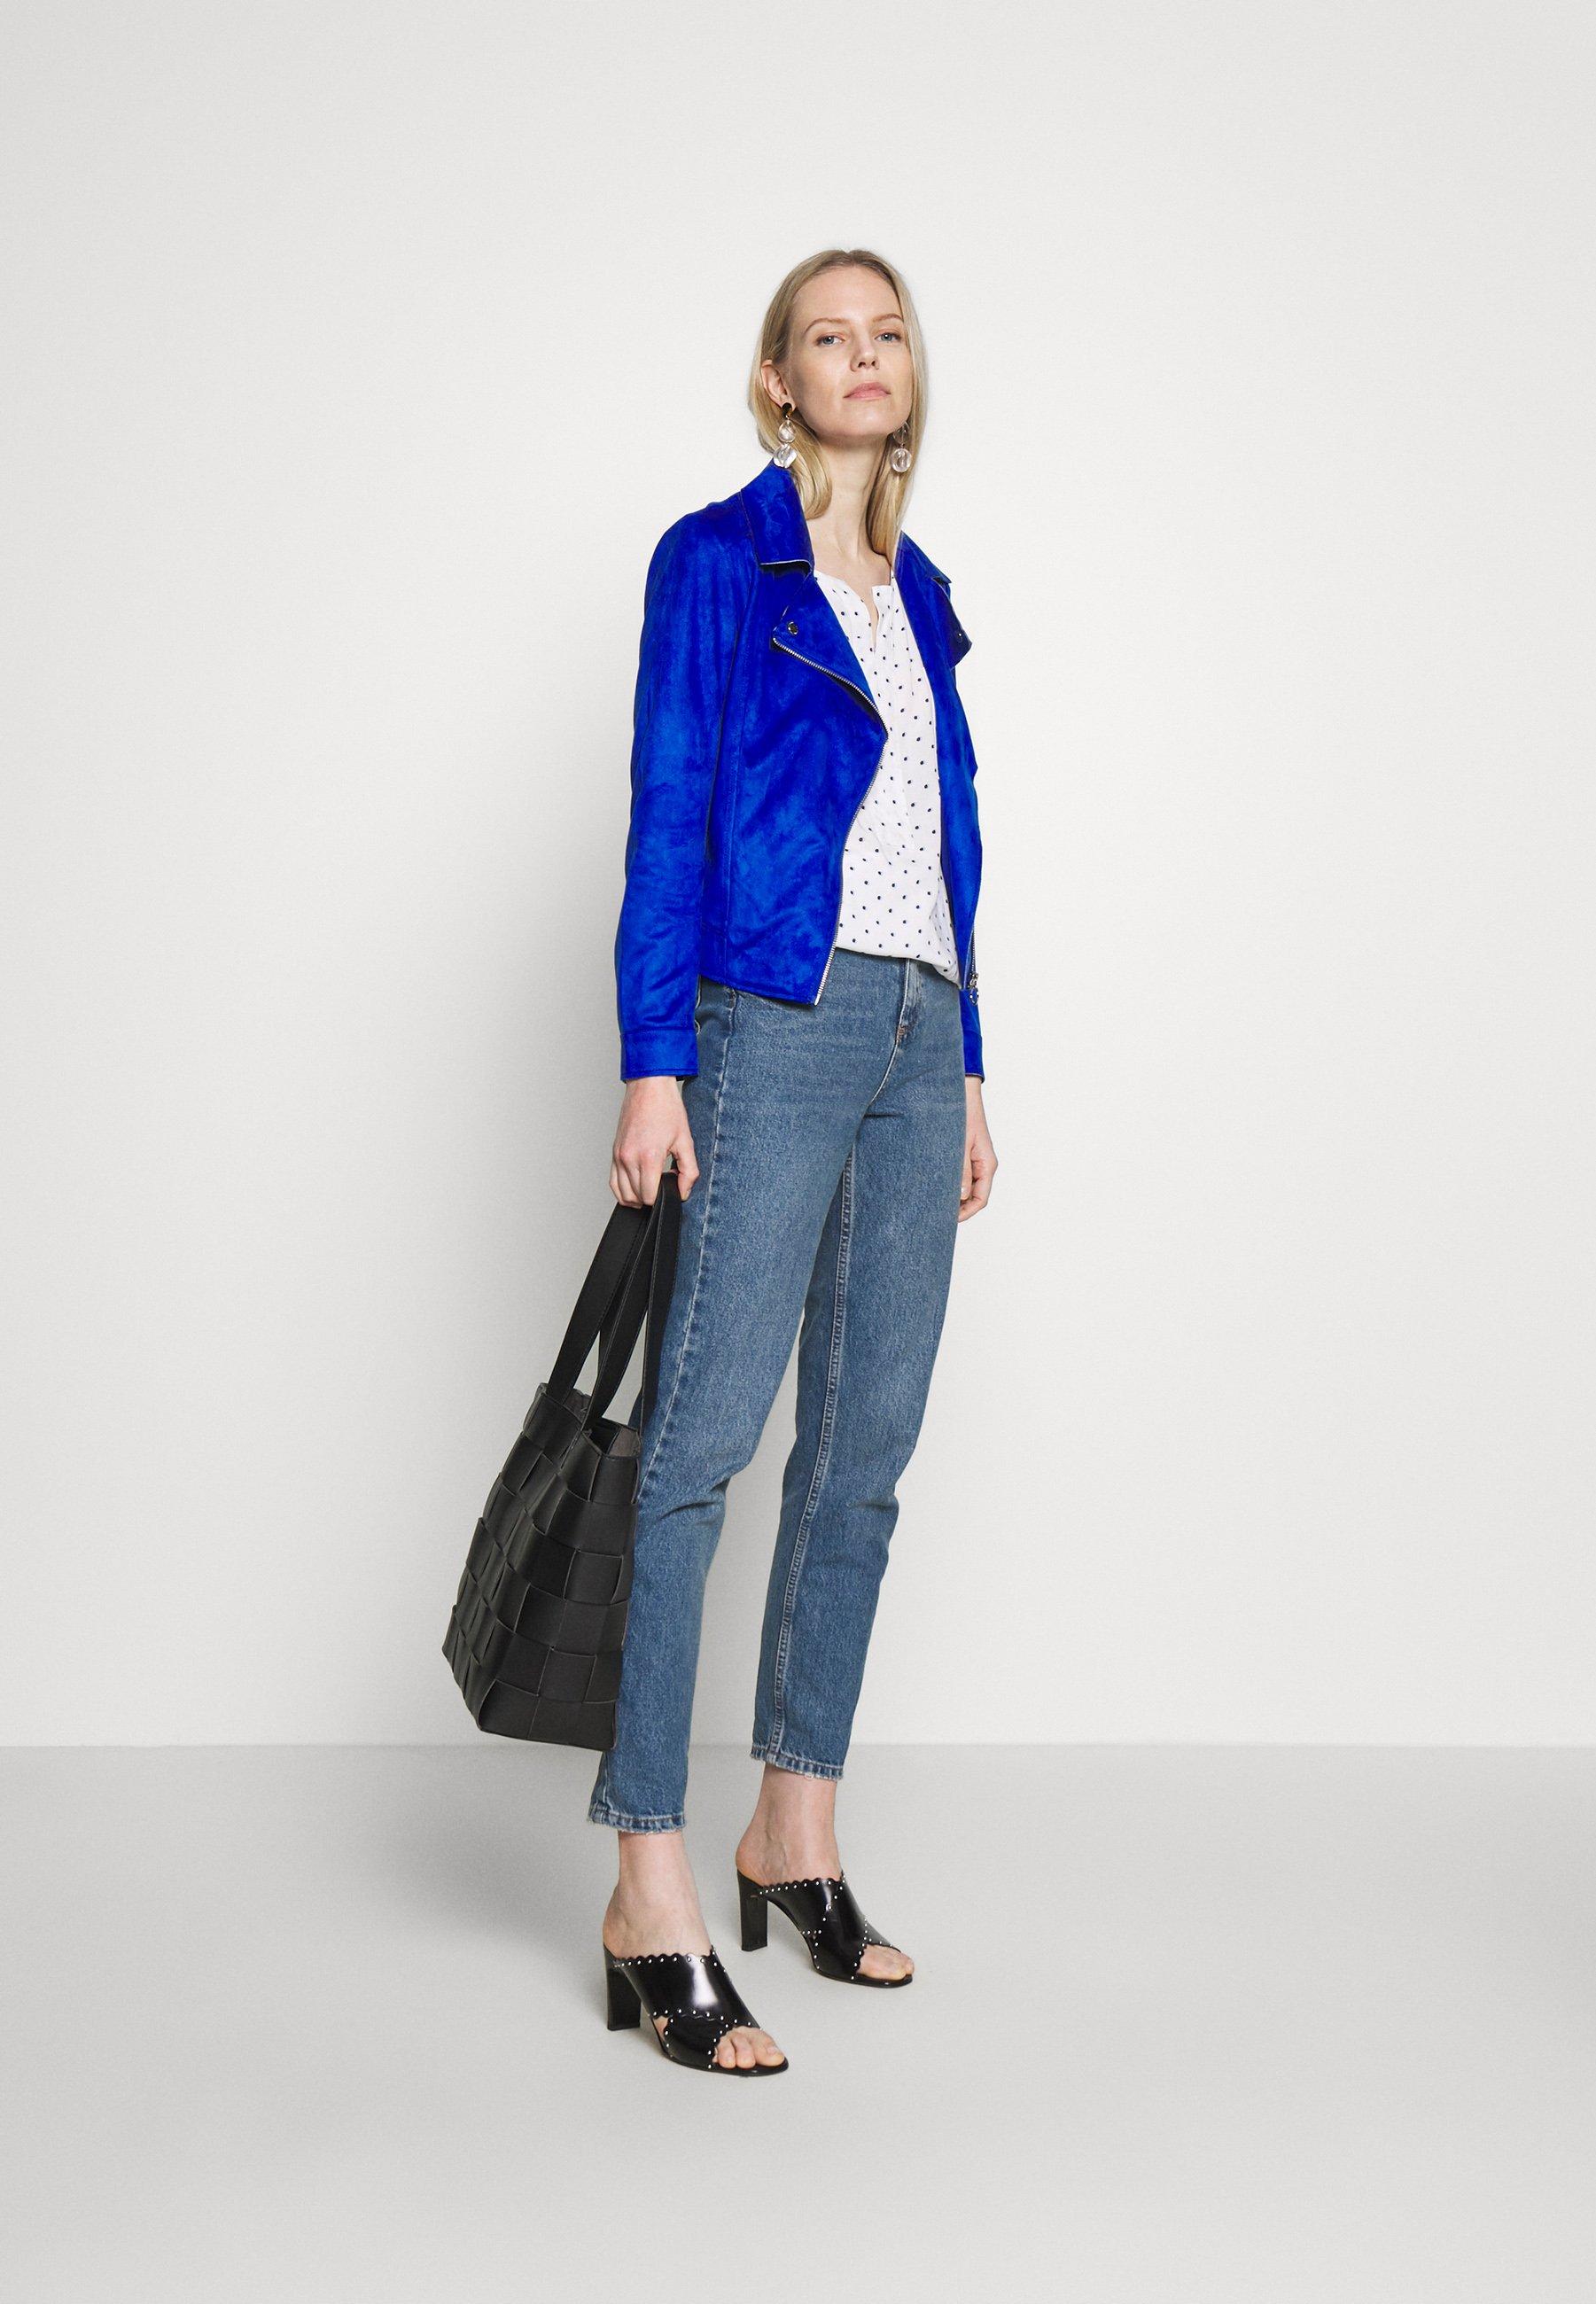 Betty & Co Blus - White/blue